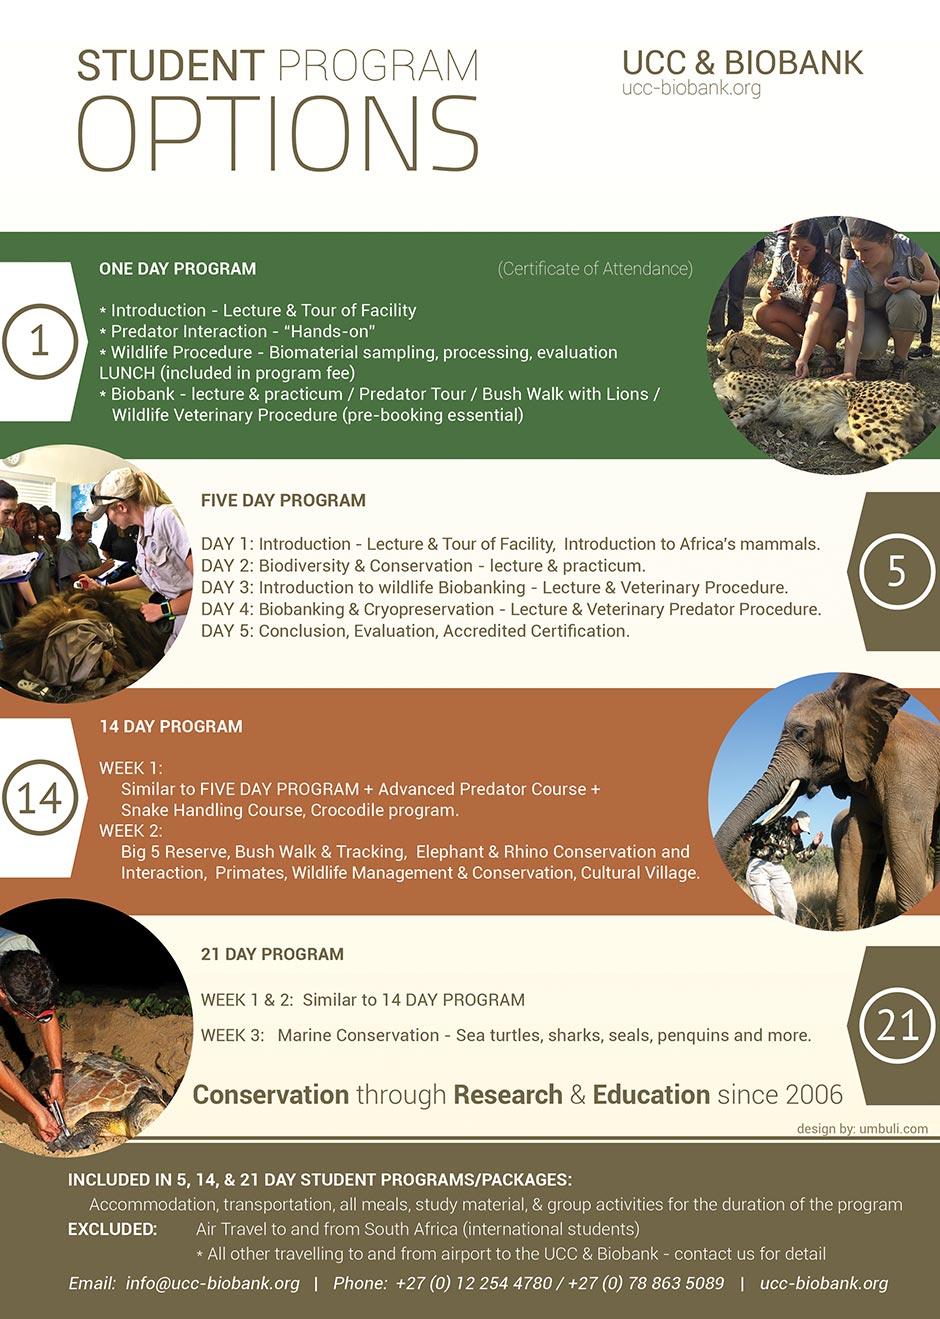 Ucc Biobank Student Program